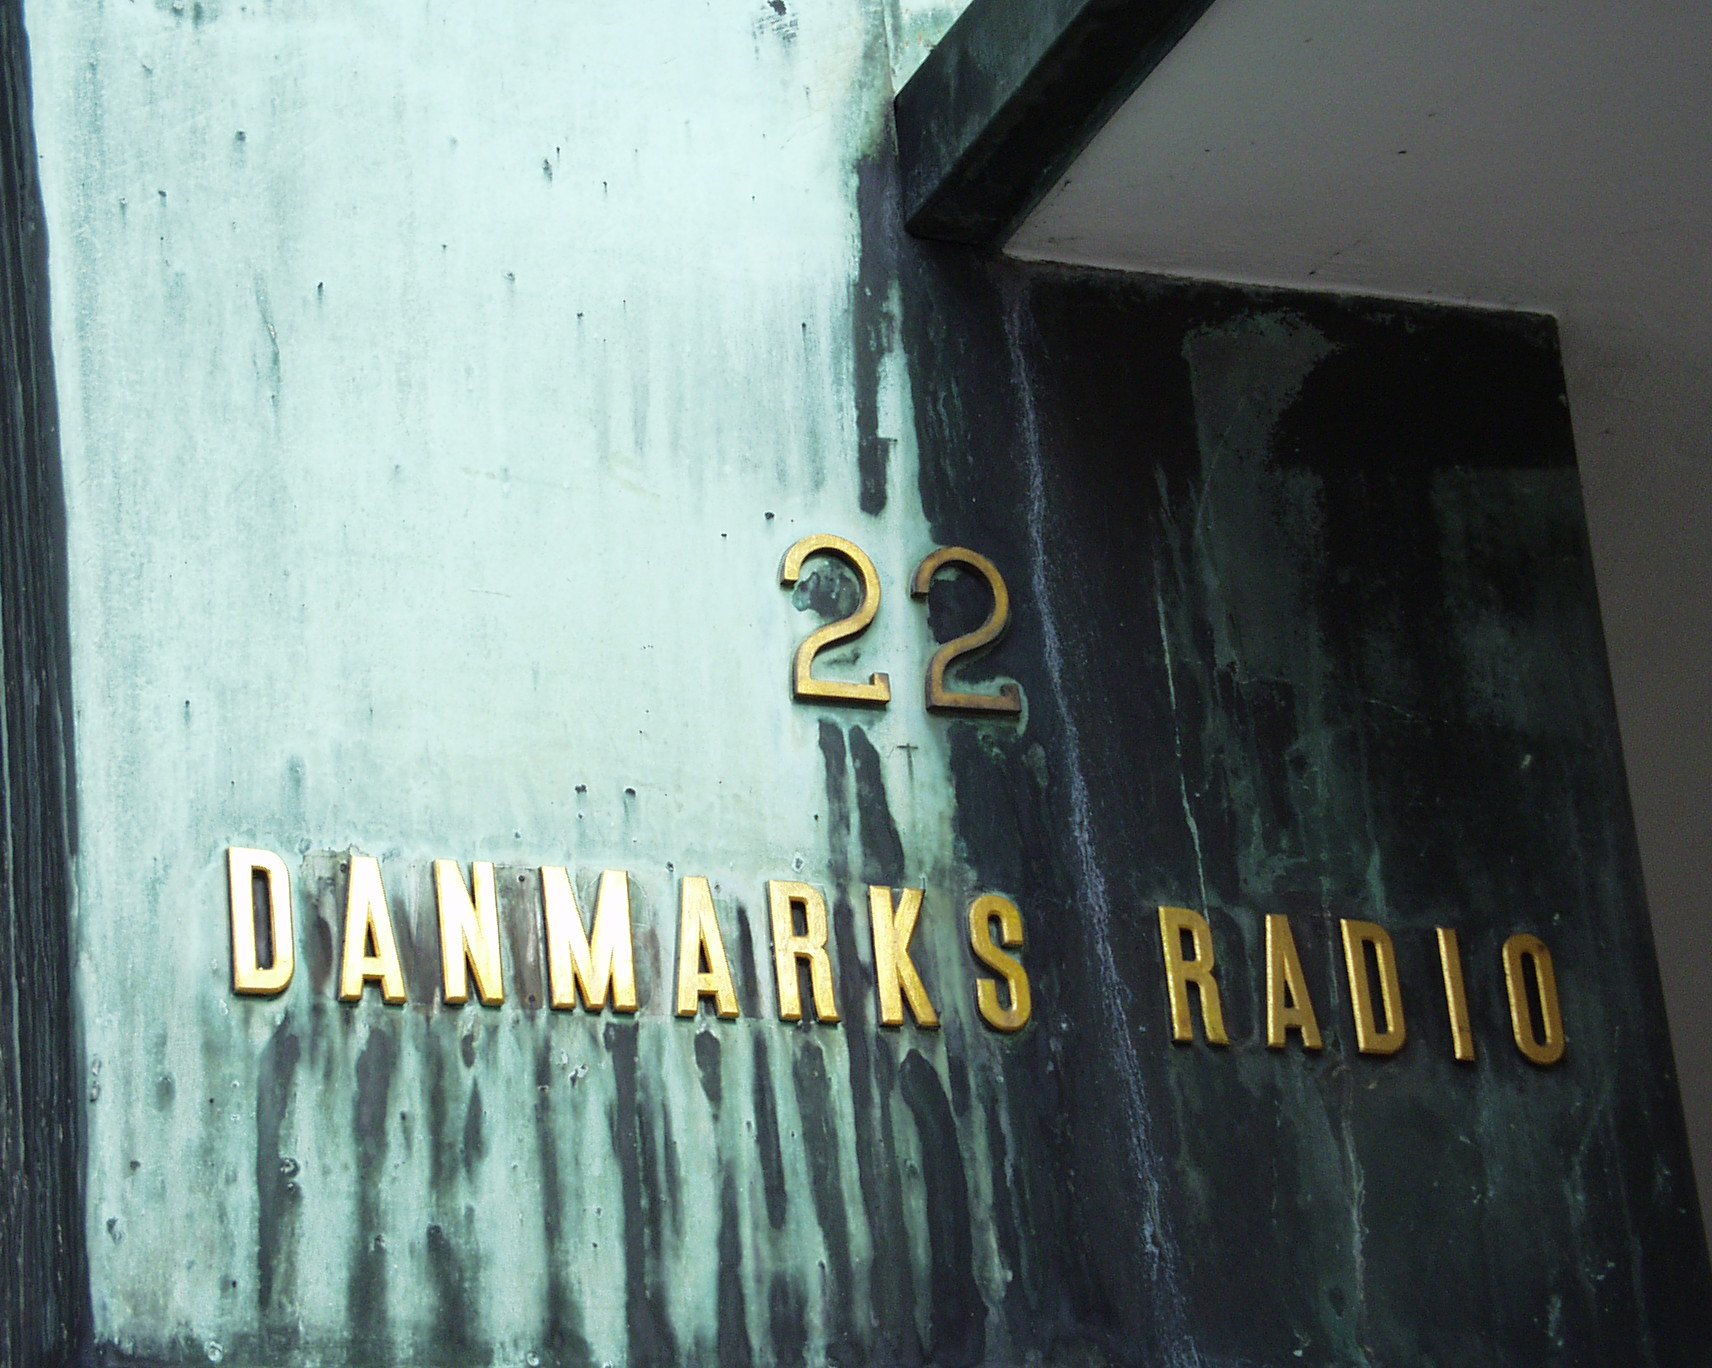 Filedanmarks Radio Radiohusetjpg Wikimedia Commons